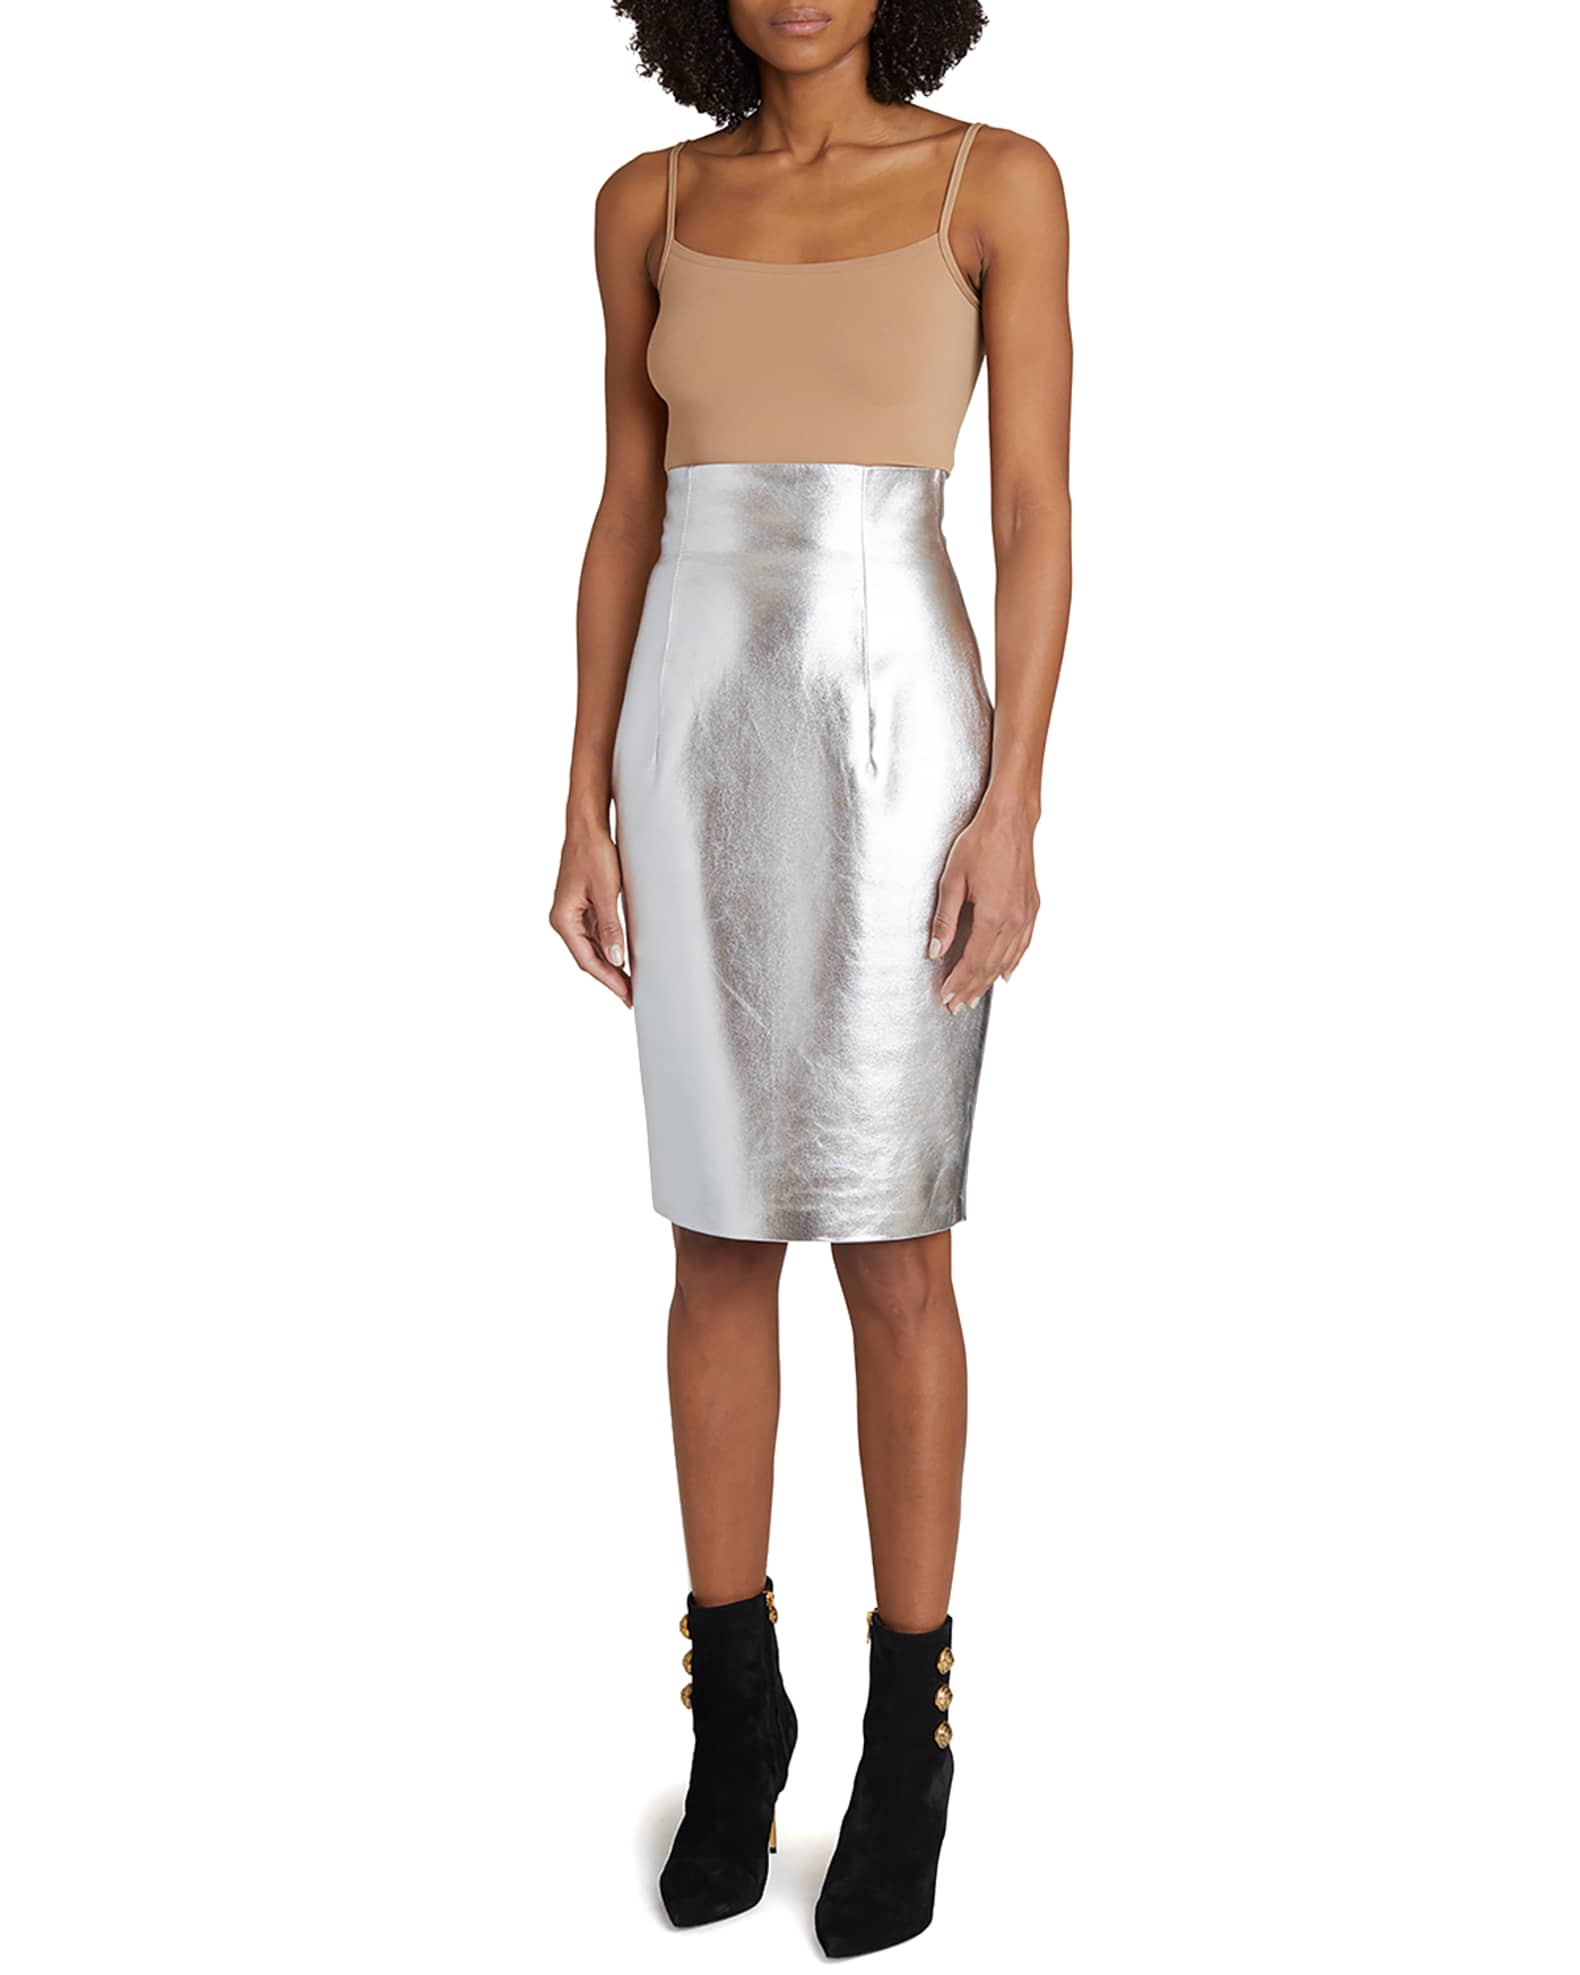 BALMAIN Silver Metallic Leather Pencil Skirt